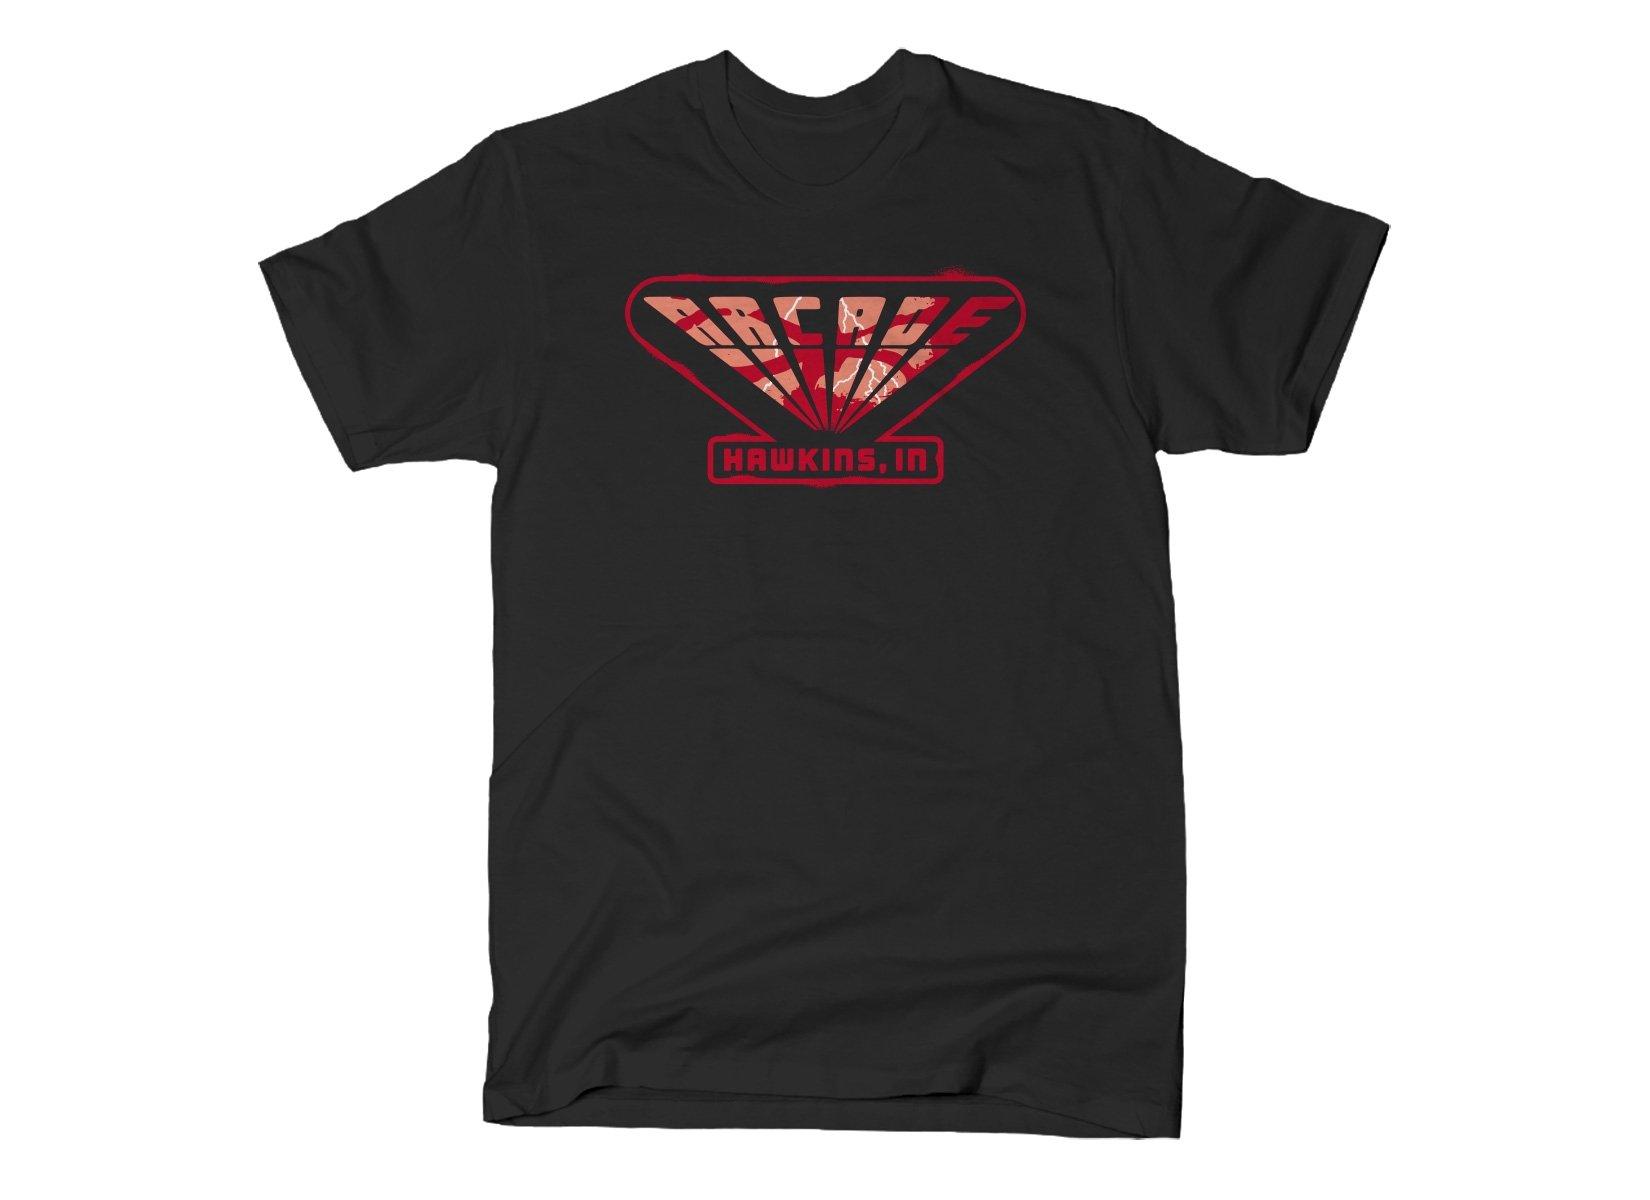 Arcade on Mens T-Shirt